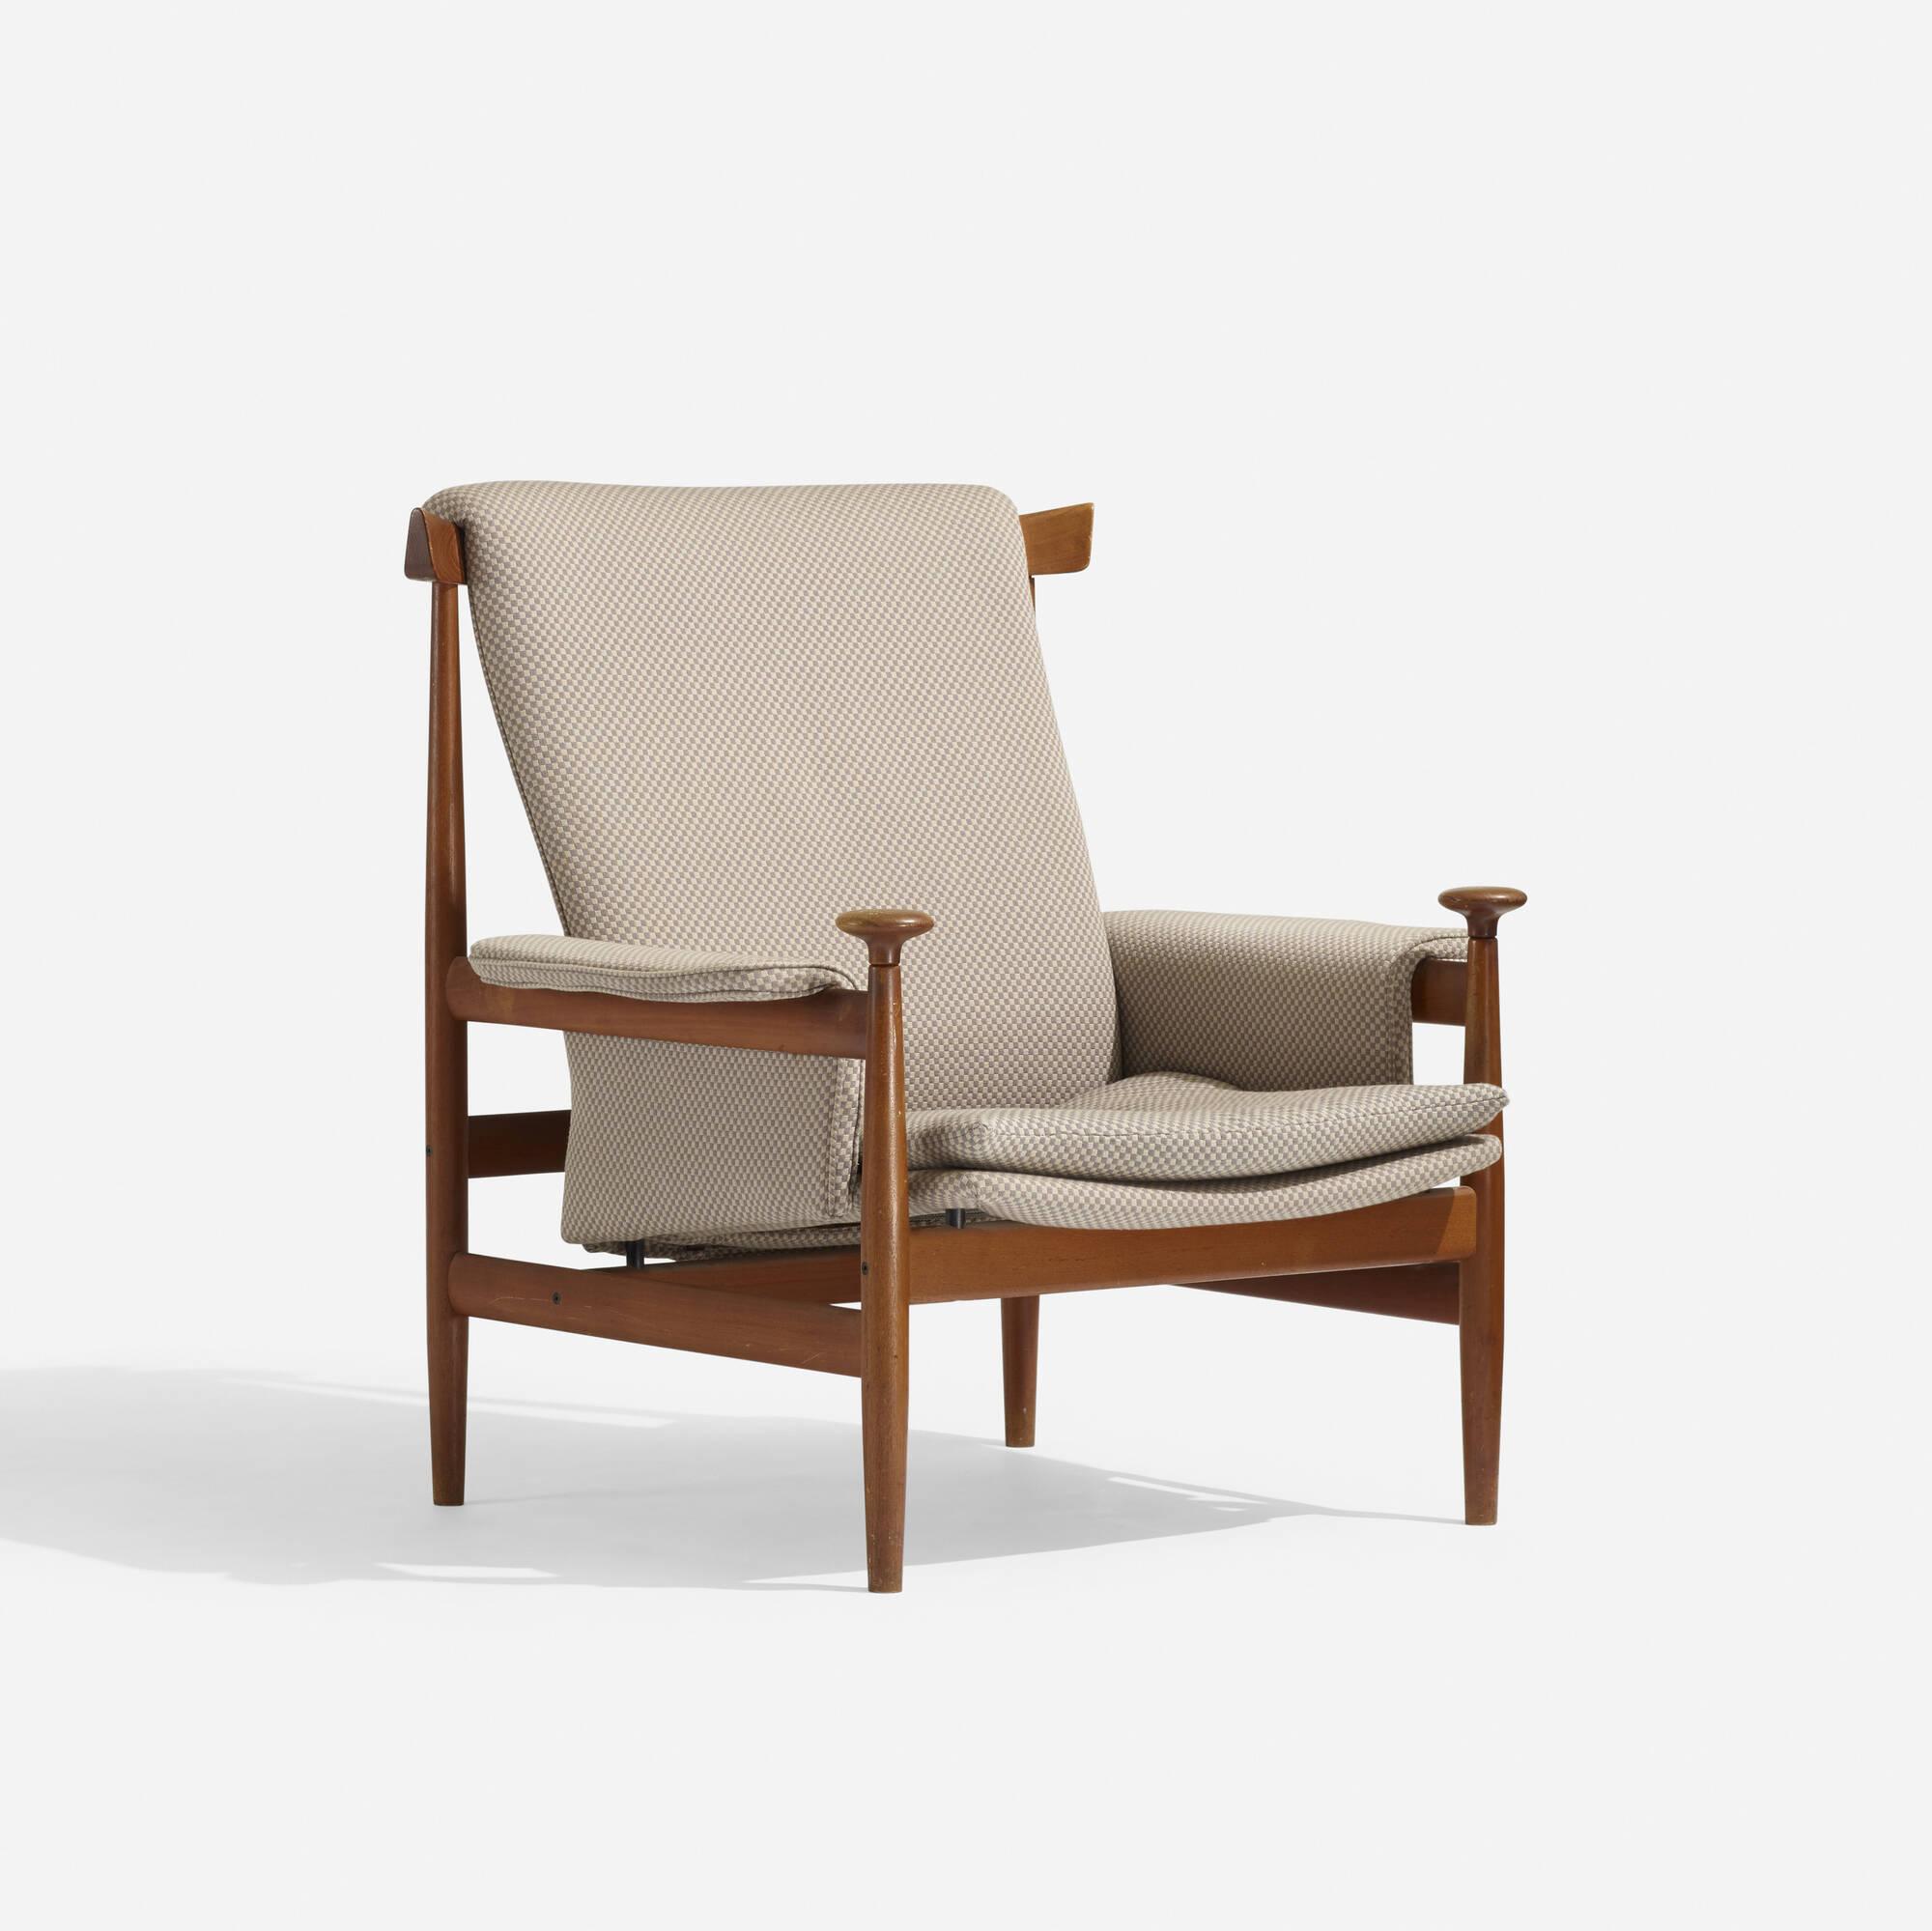 349: Finn Juhl / Bwana armchair (1 of 4)